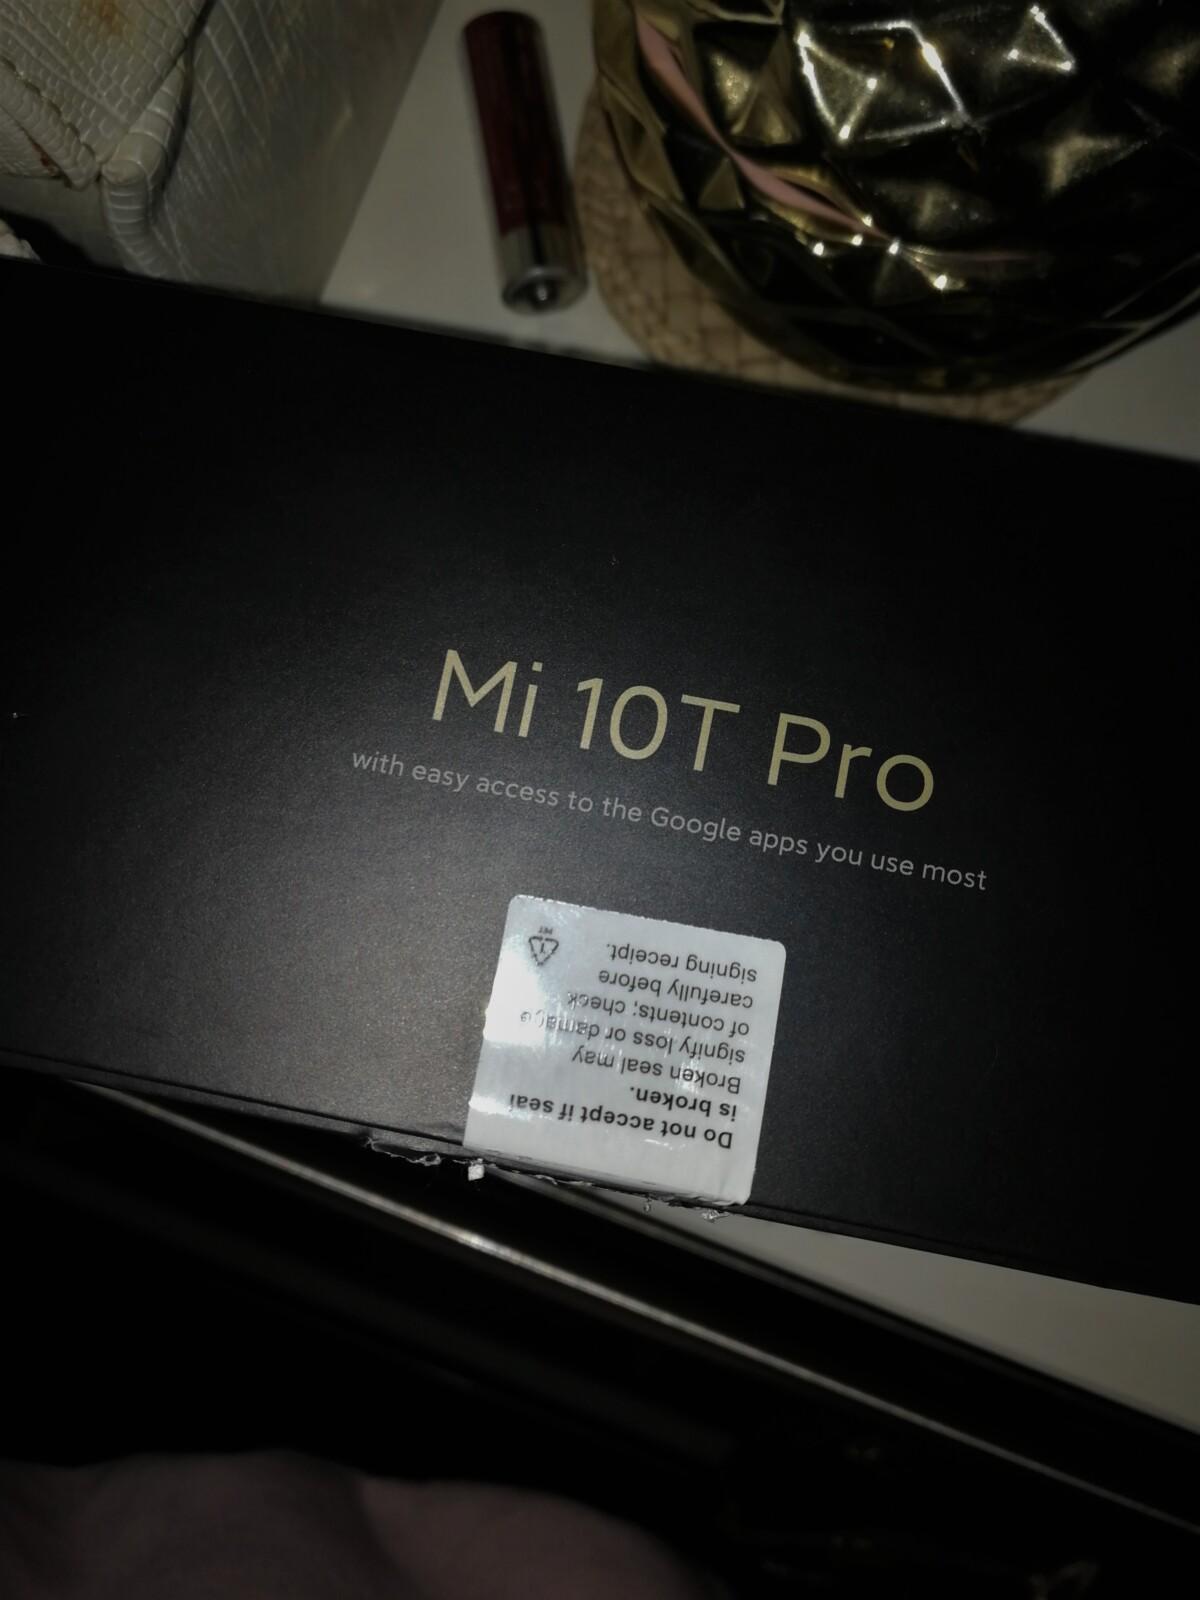 phone-mobile-mobilphone-mobil-telefon-10t-mixiaomi-mi-xiaomi-nymobil-newin-new-mi10tpro-5g-10tpro-anbefaling-gadgets-nytelefon-2-isalicious-isalicious.blogg_.no-blogger-blogg